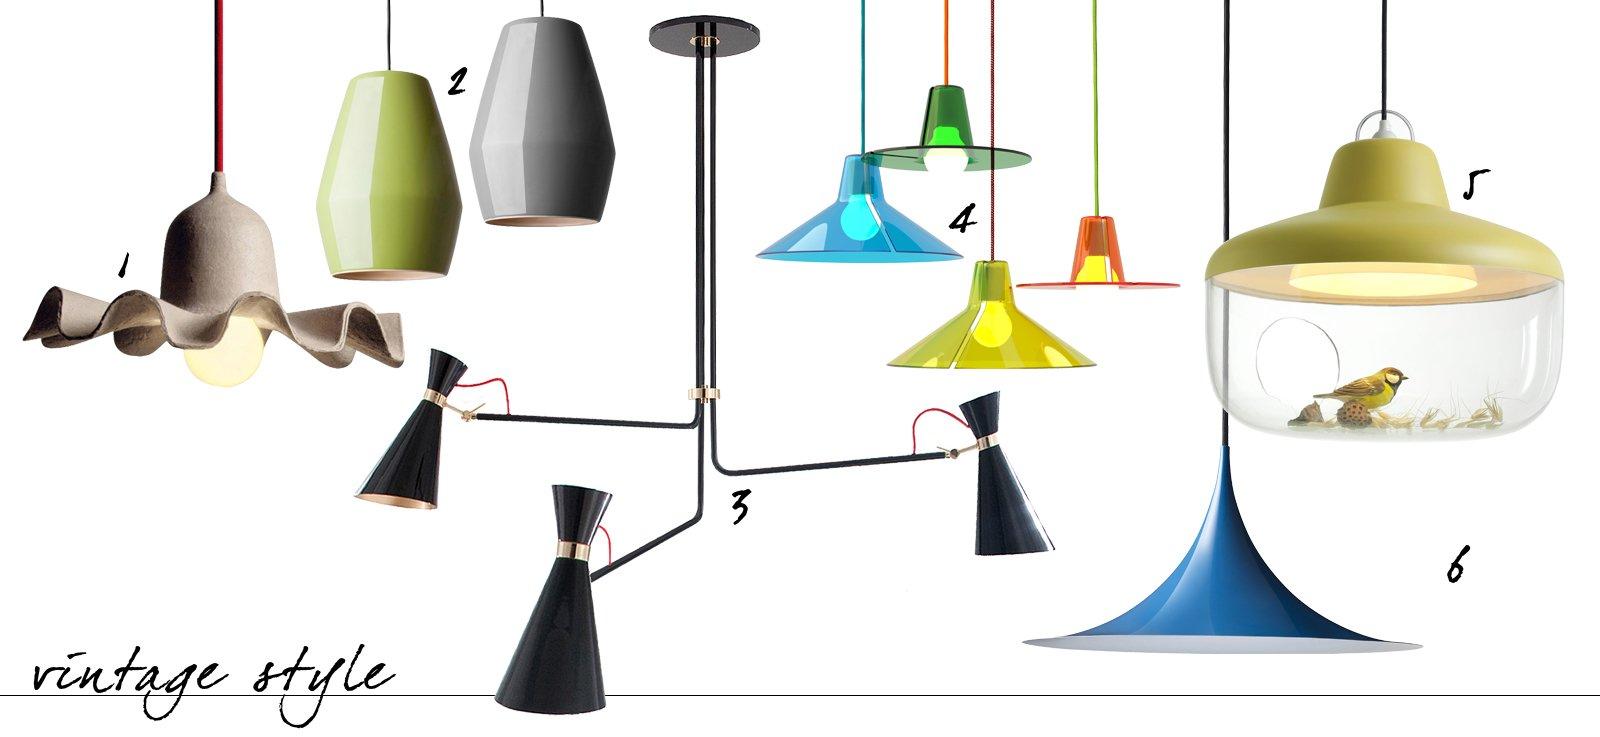 Lampade e lampadari a sospensione in tre stili diversi for Lampadari pendenti